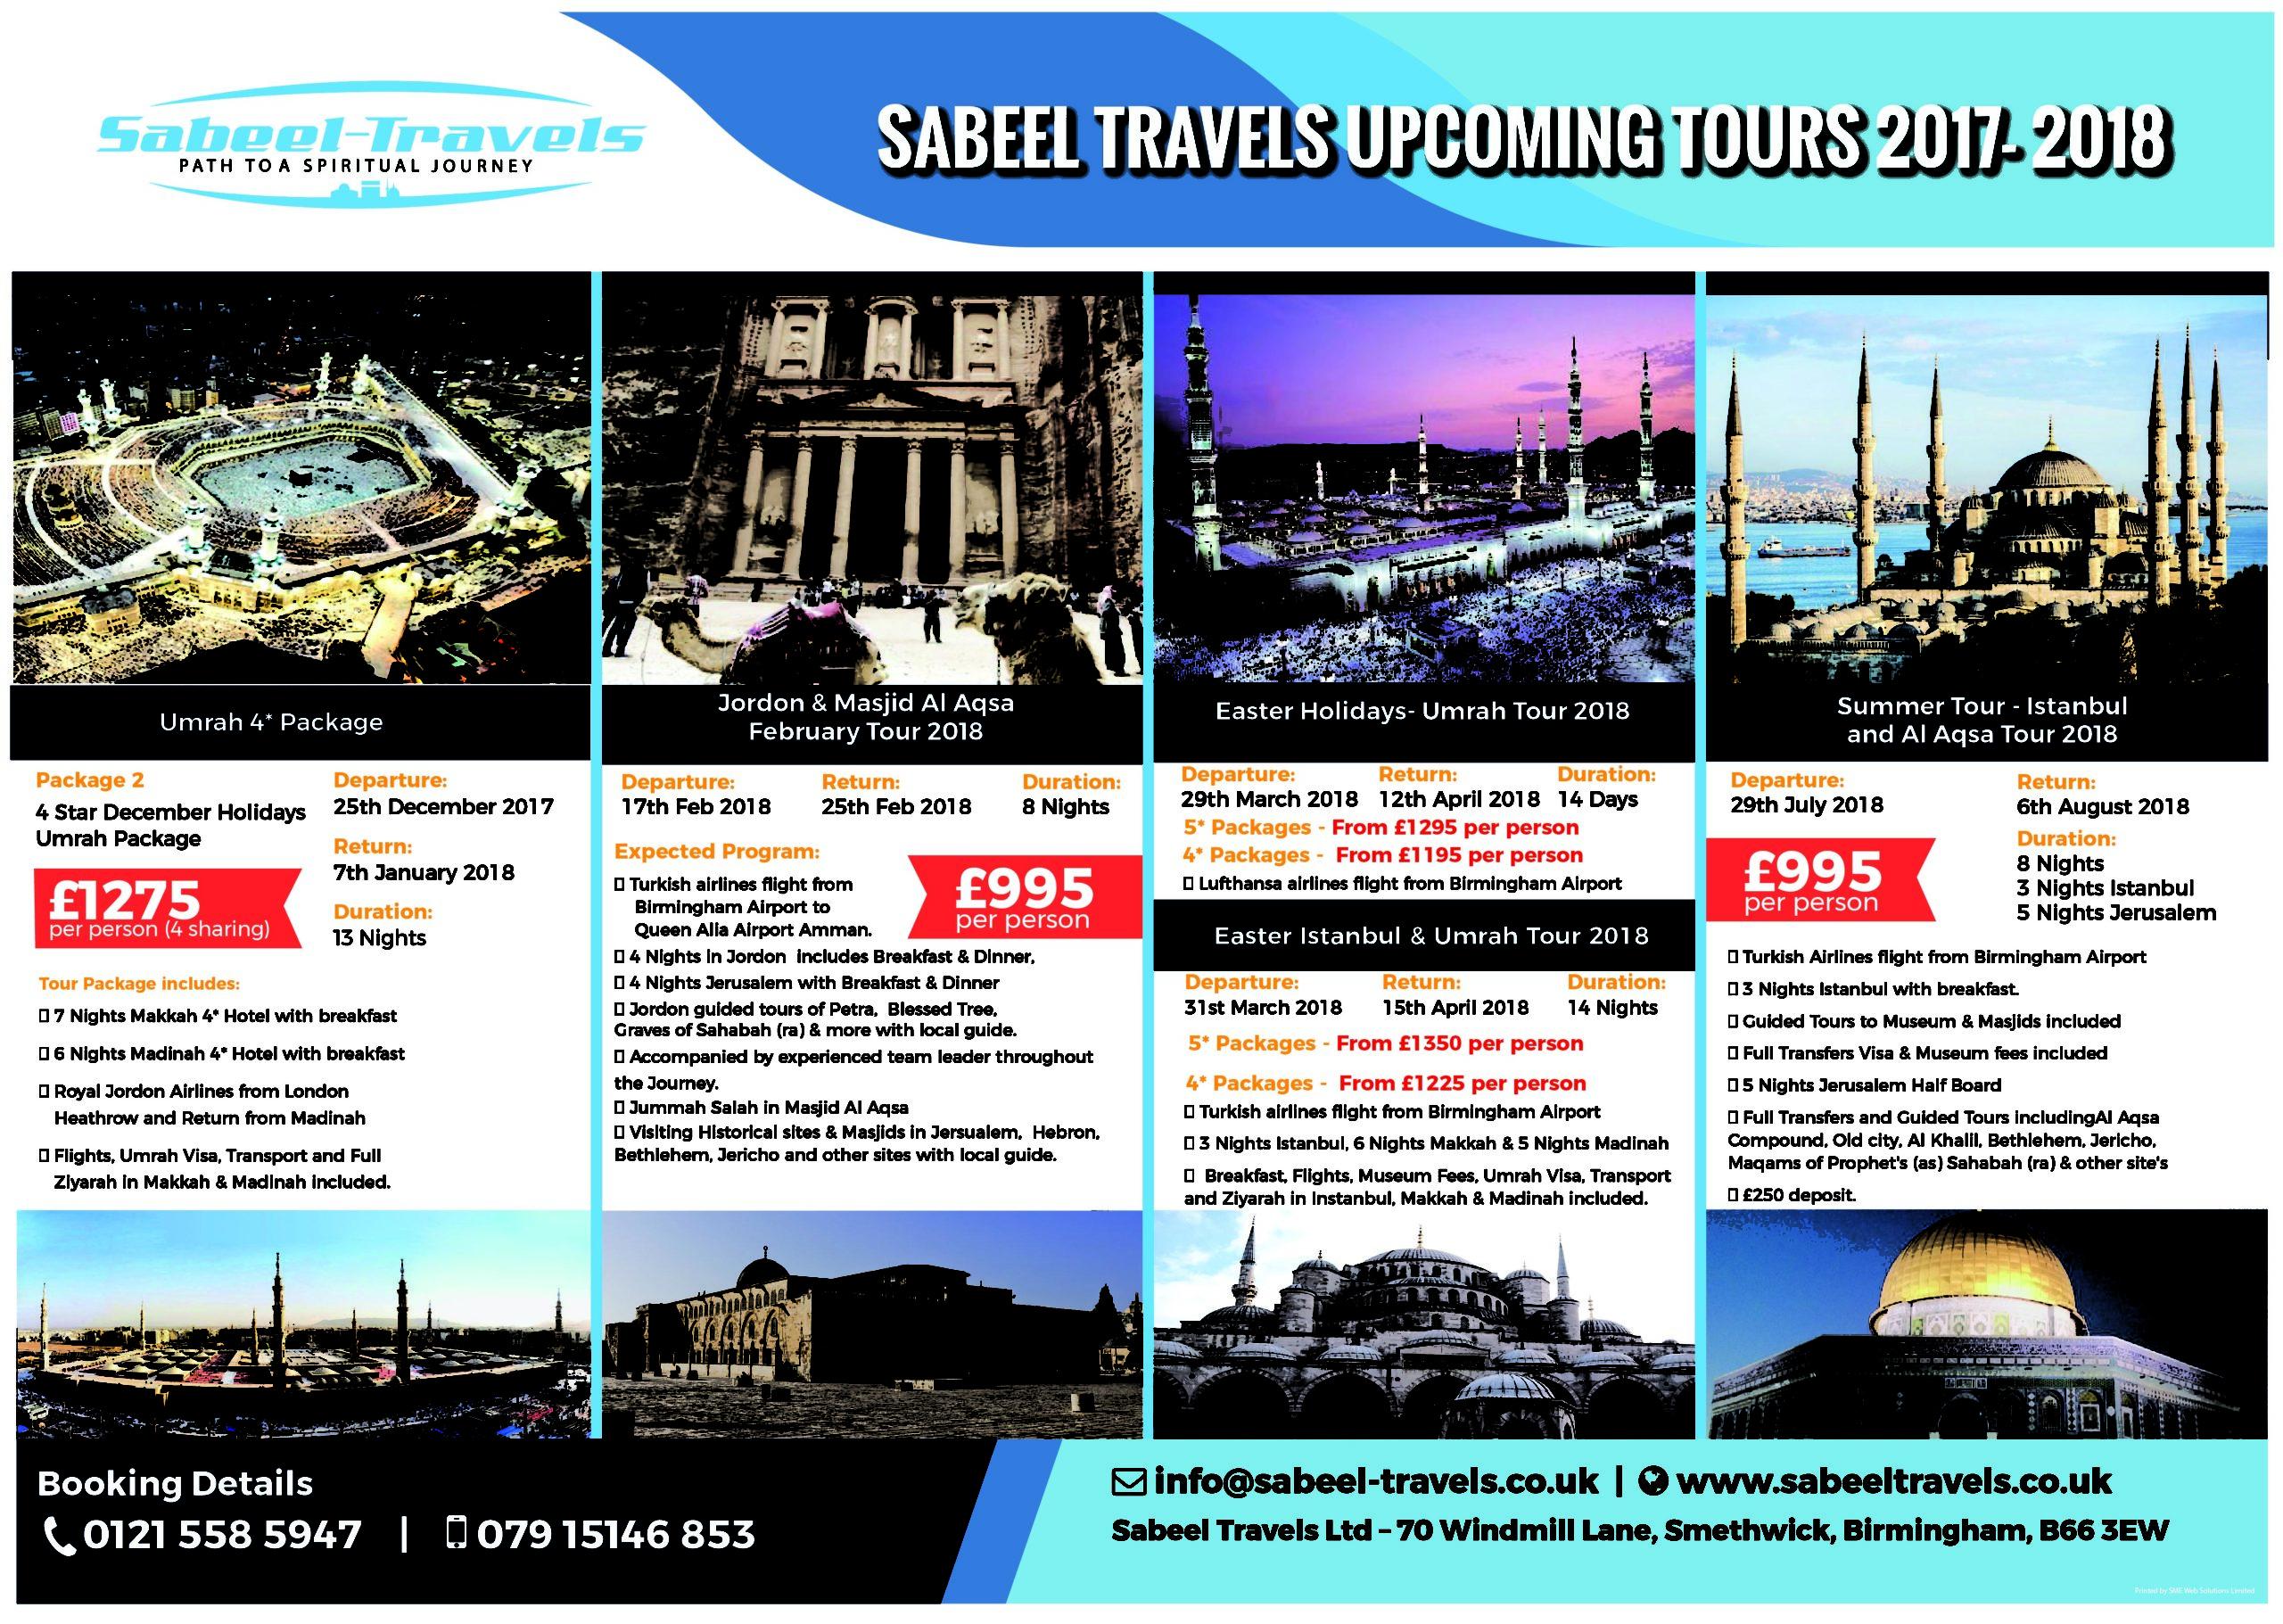 Sabeel Travels Poster 2017-2018 Tours